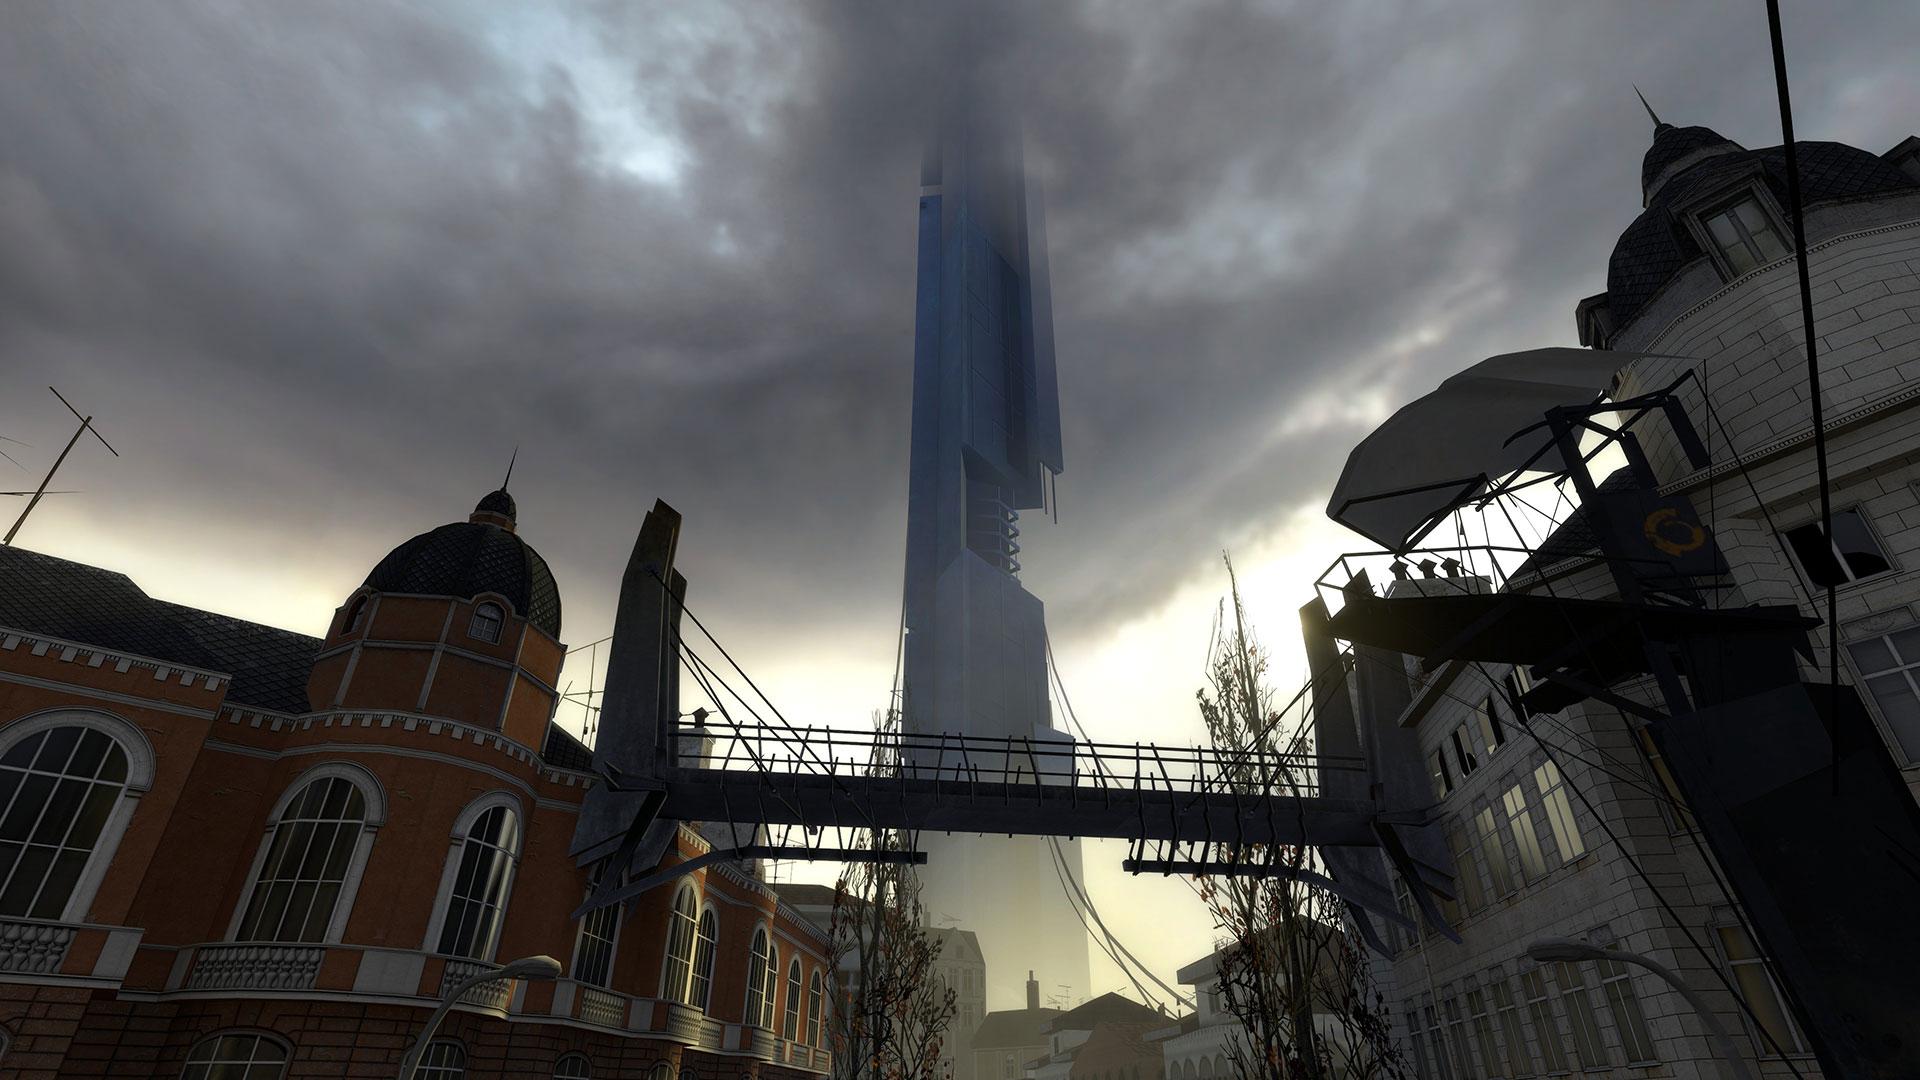 Half life 2 trailer gameplay venice - Italian Guide